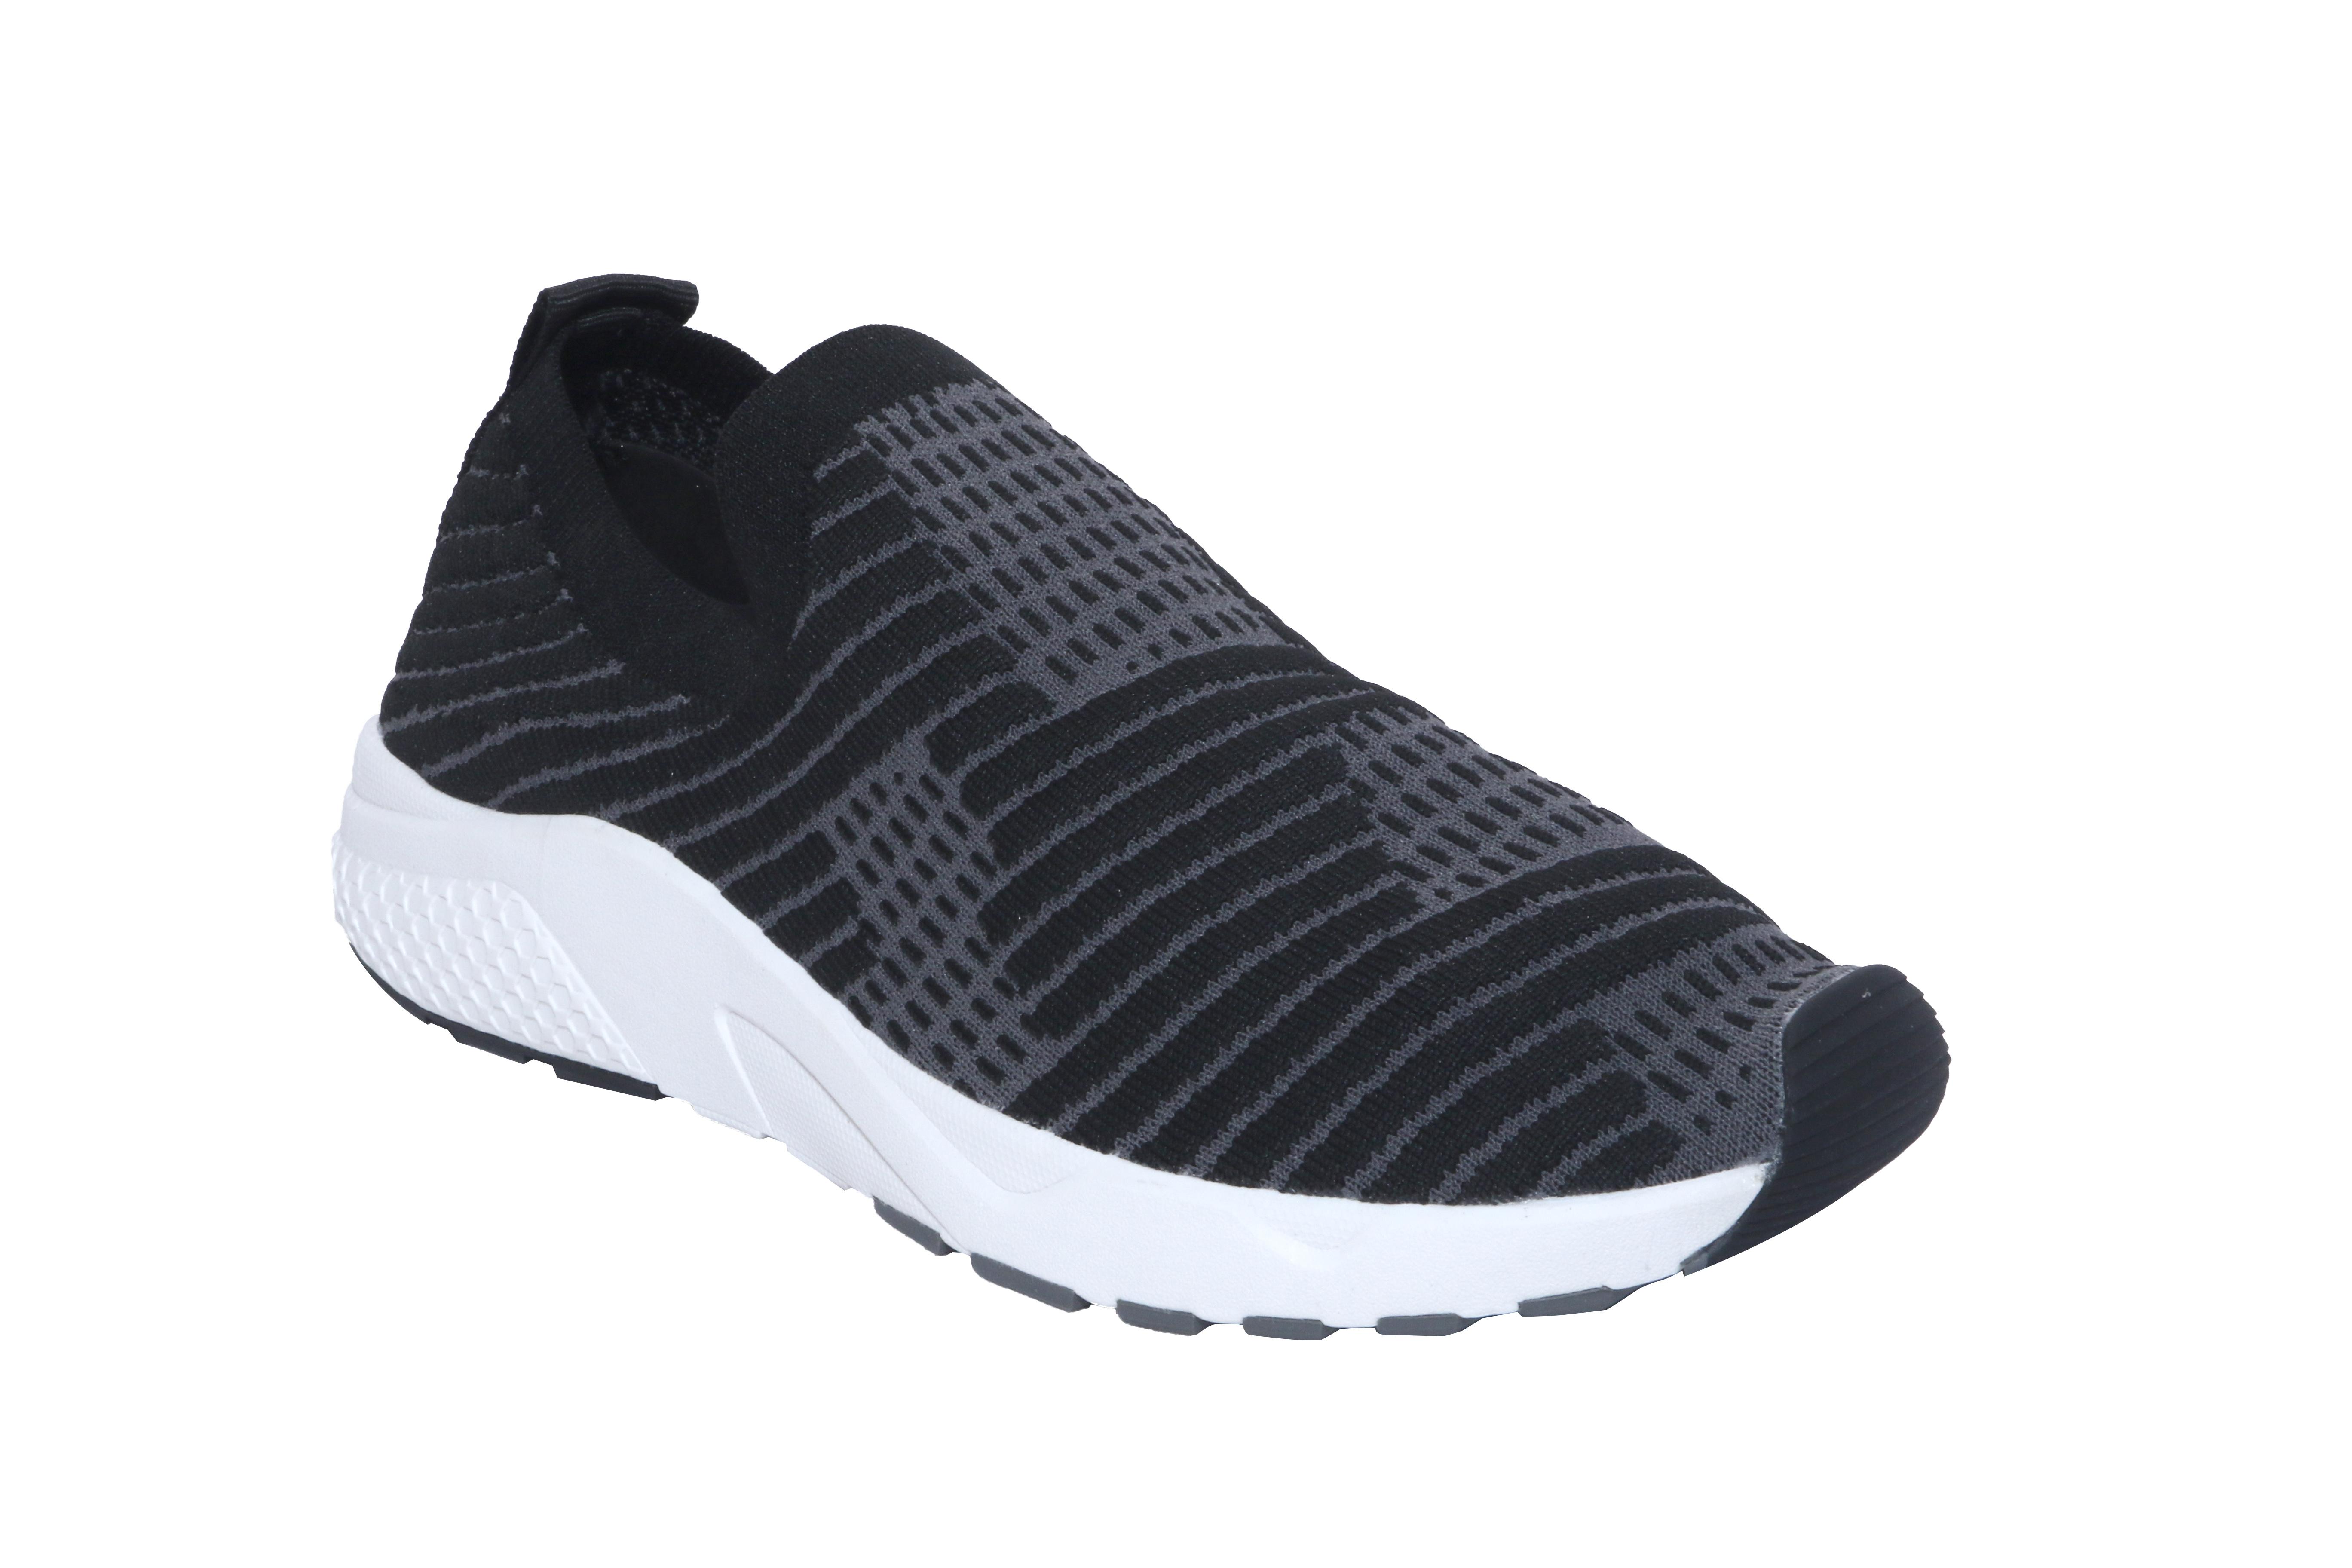 Lotto | Lotto Women's Breeze Sock W All Black/Light Asphalt Training Shoes